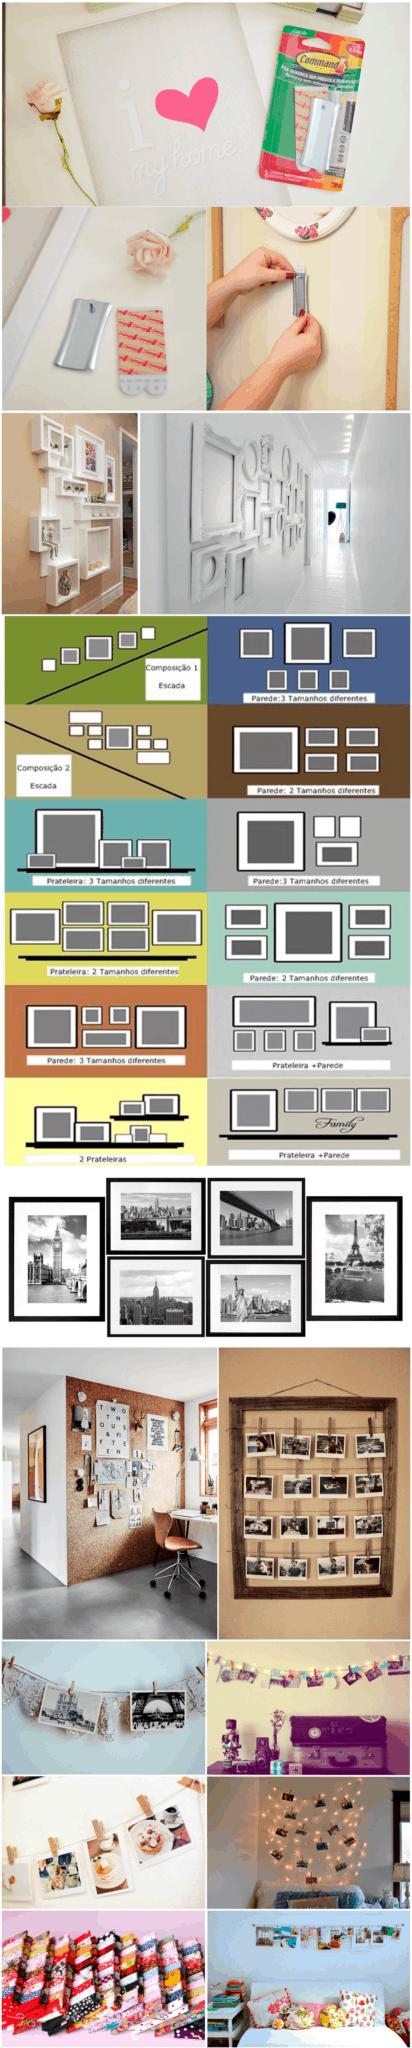 decor-apartamento-alugado-fotos